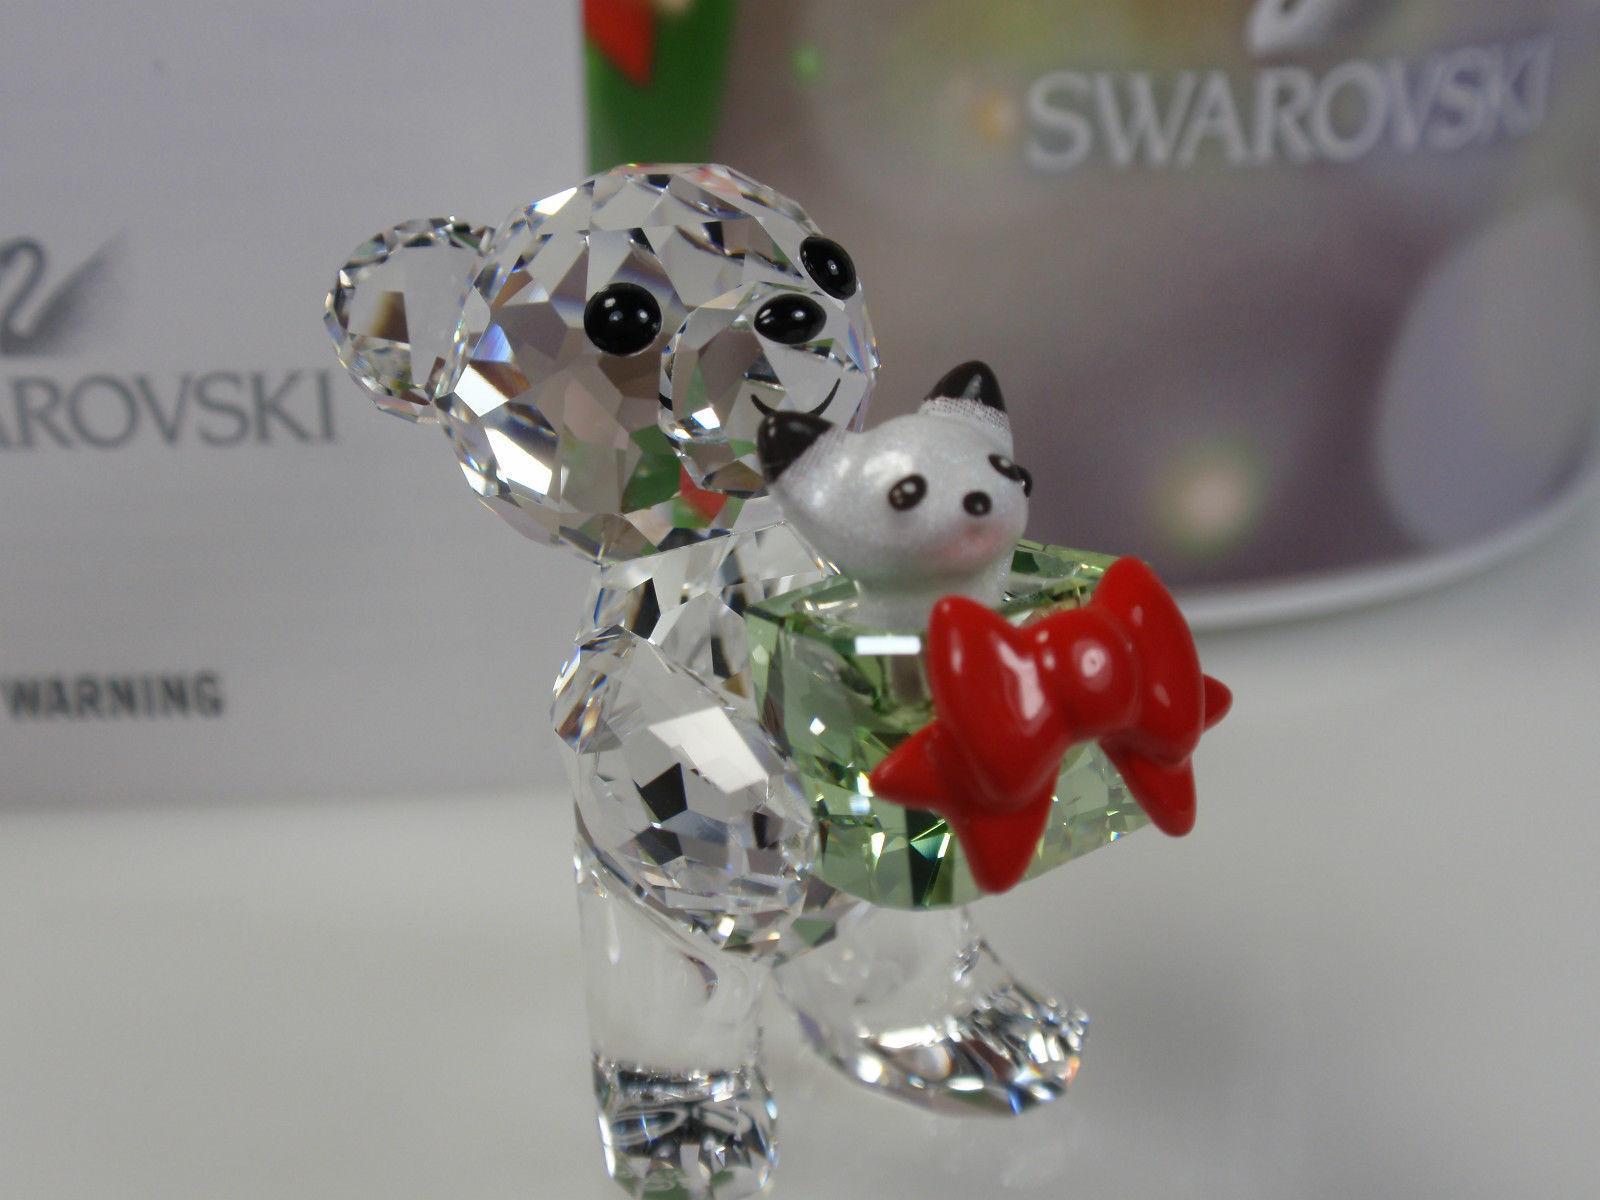 Swarovski limitada edición 2014 navideño Kris oso Bear 5058935 ap 2014 nuevo